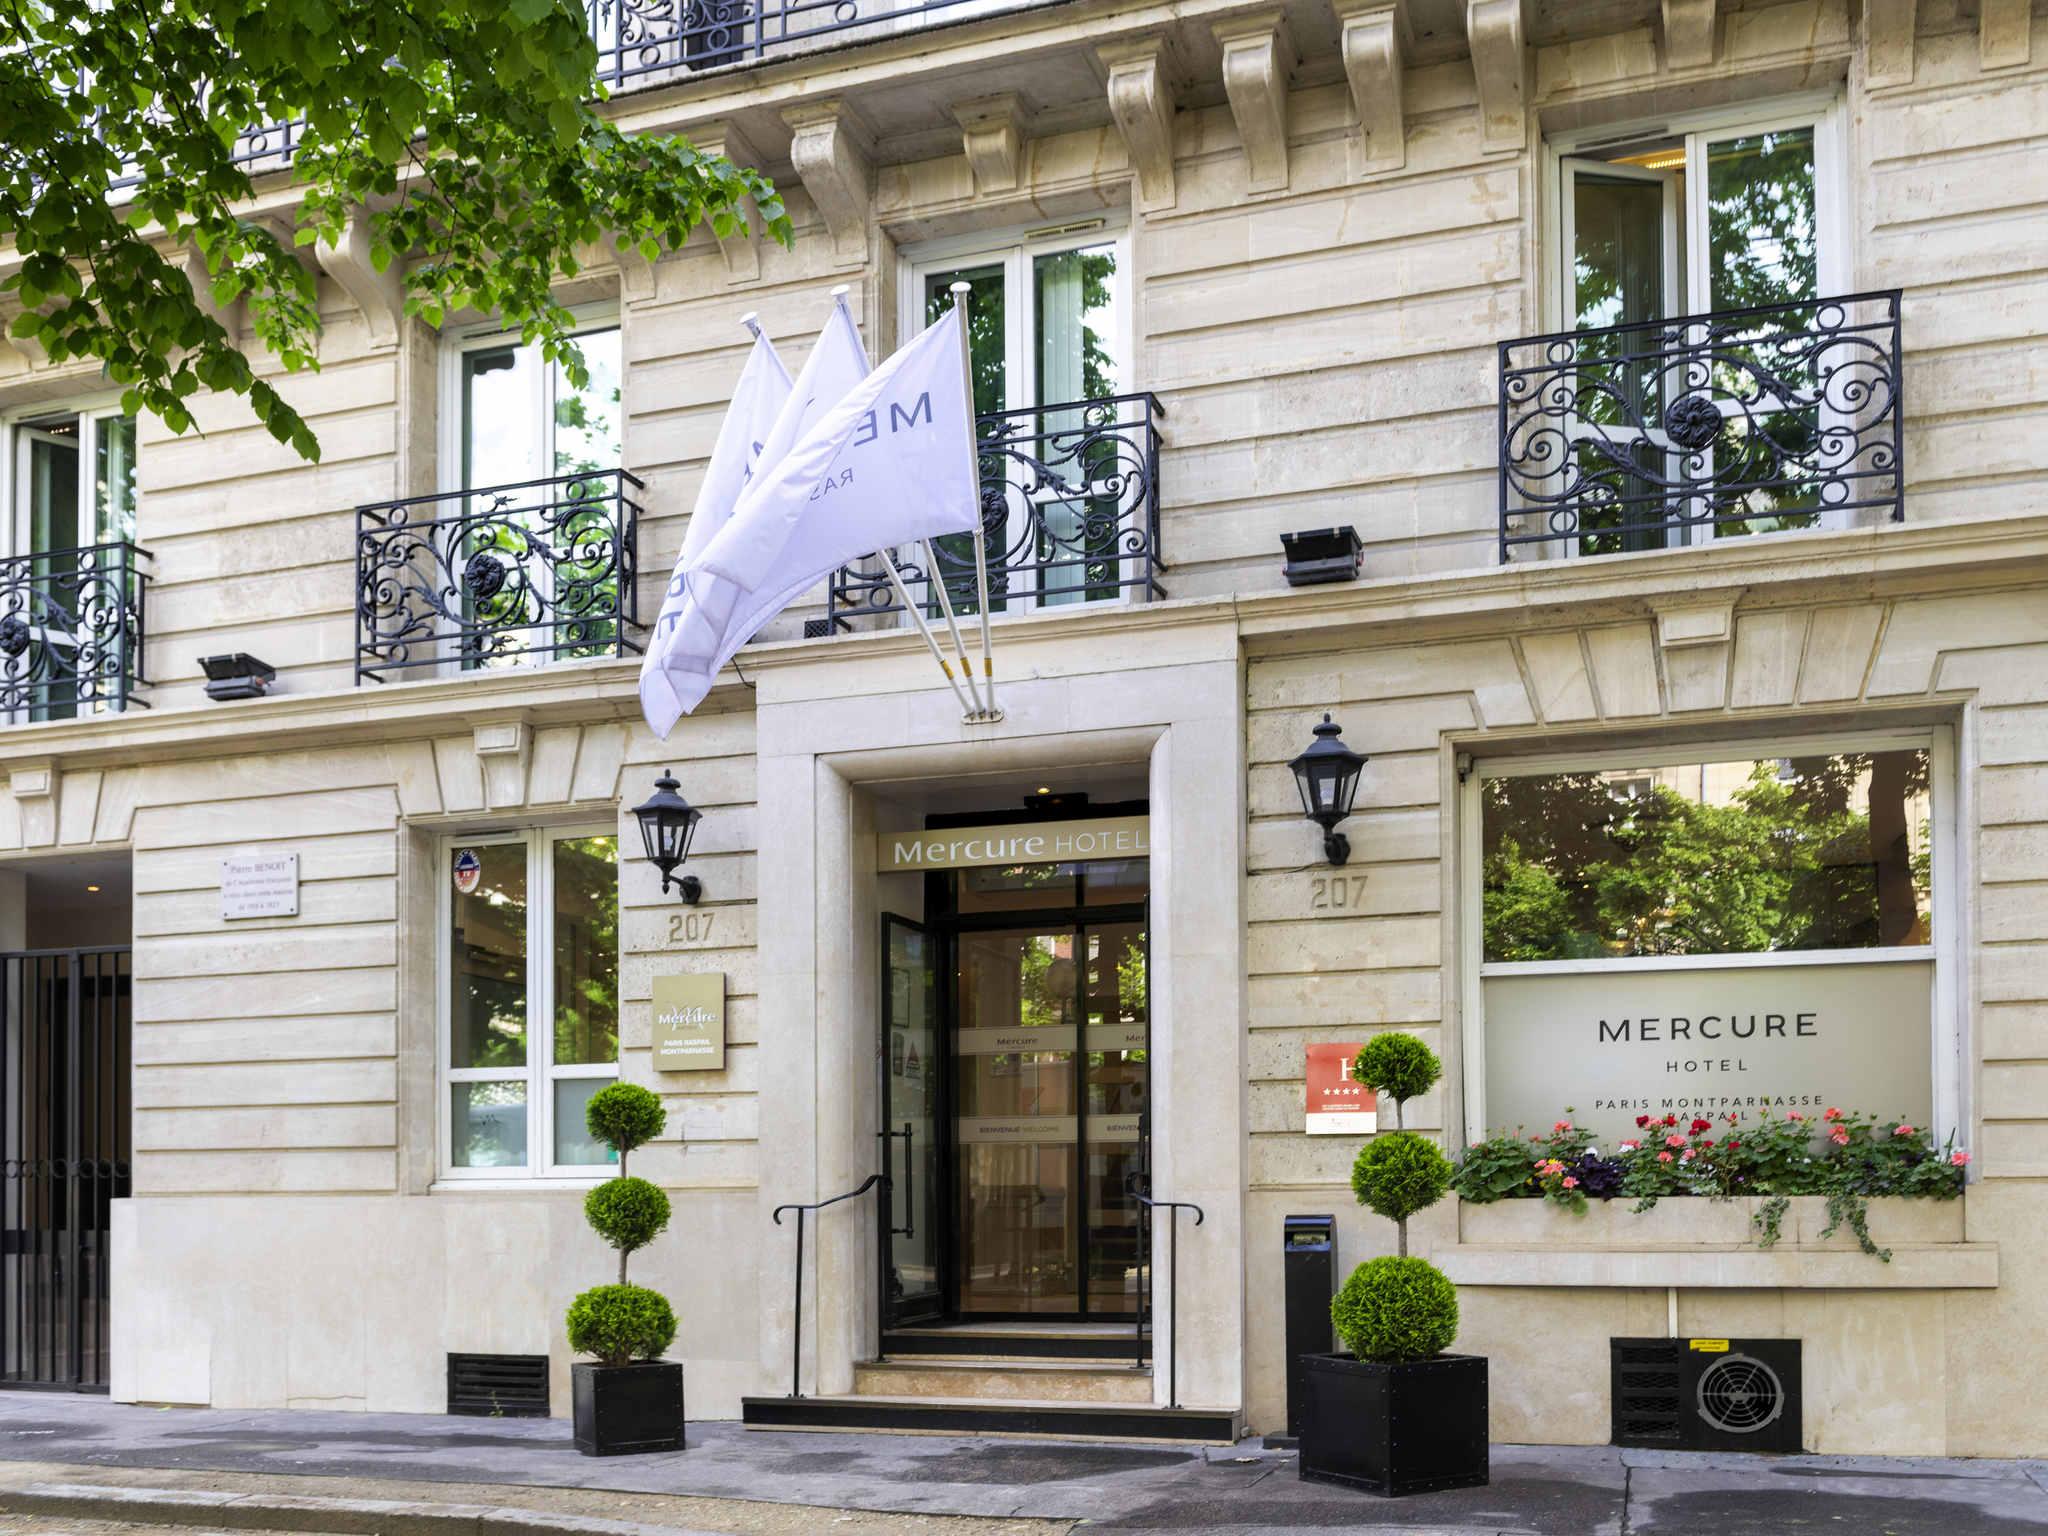 فندق - مركيور Mercure باريس مونبارناس راسباي